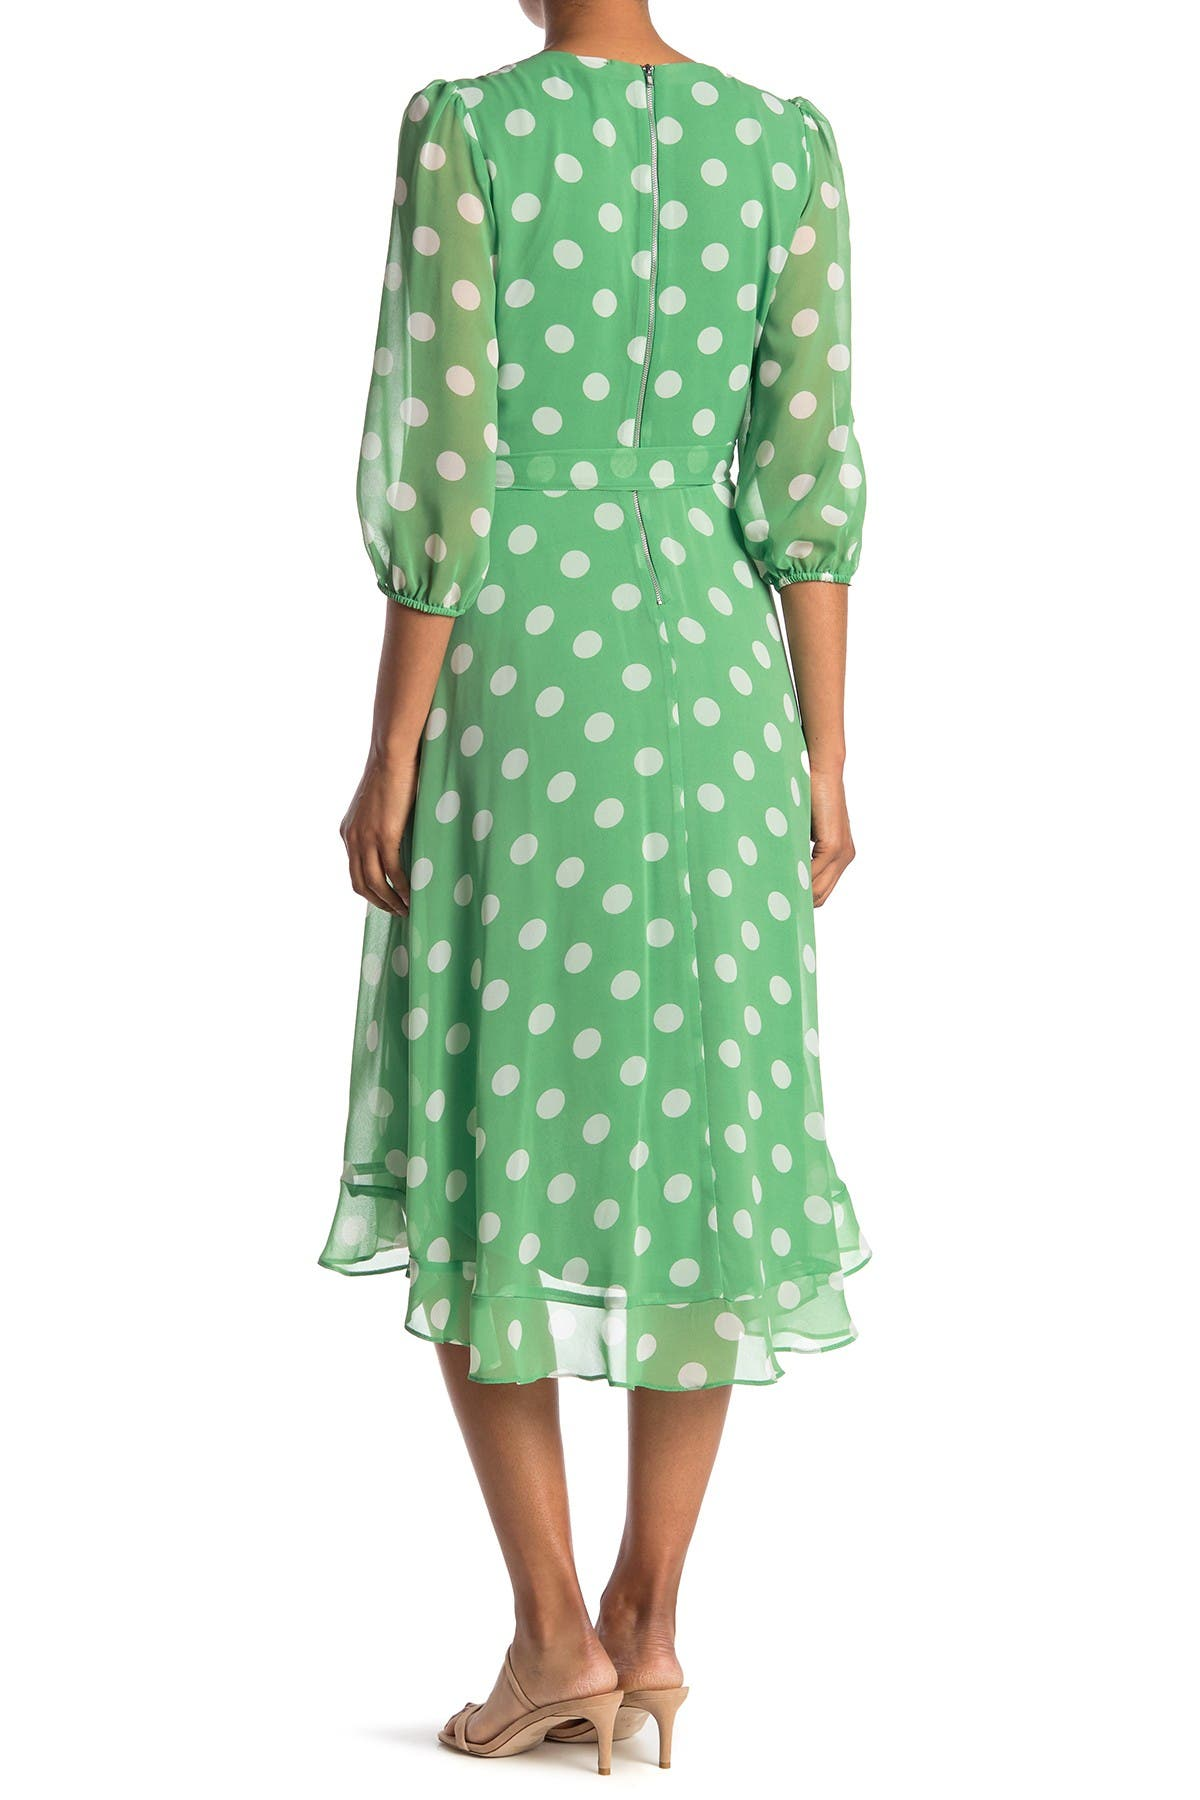 1980s Clothing, Fashion | 80s Style Clothes Gabby Skye Polka Dot Faux Wrap Chiffon Midi Dress Size 10 - Fernivory at Nordstrom Rack $39.97 AT vintagedancer.com